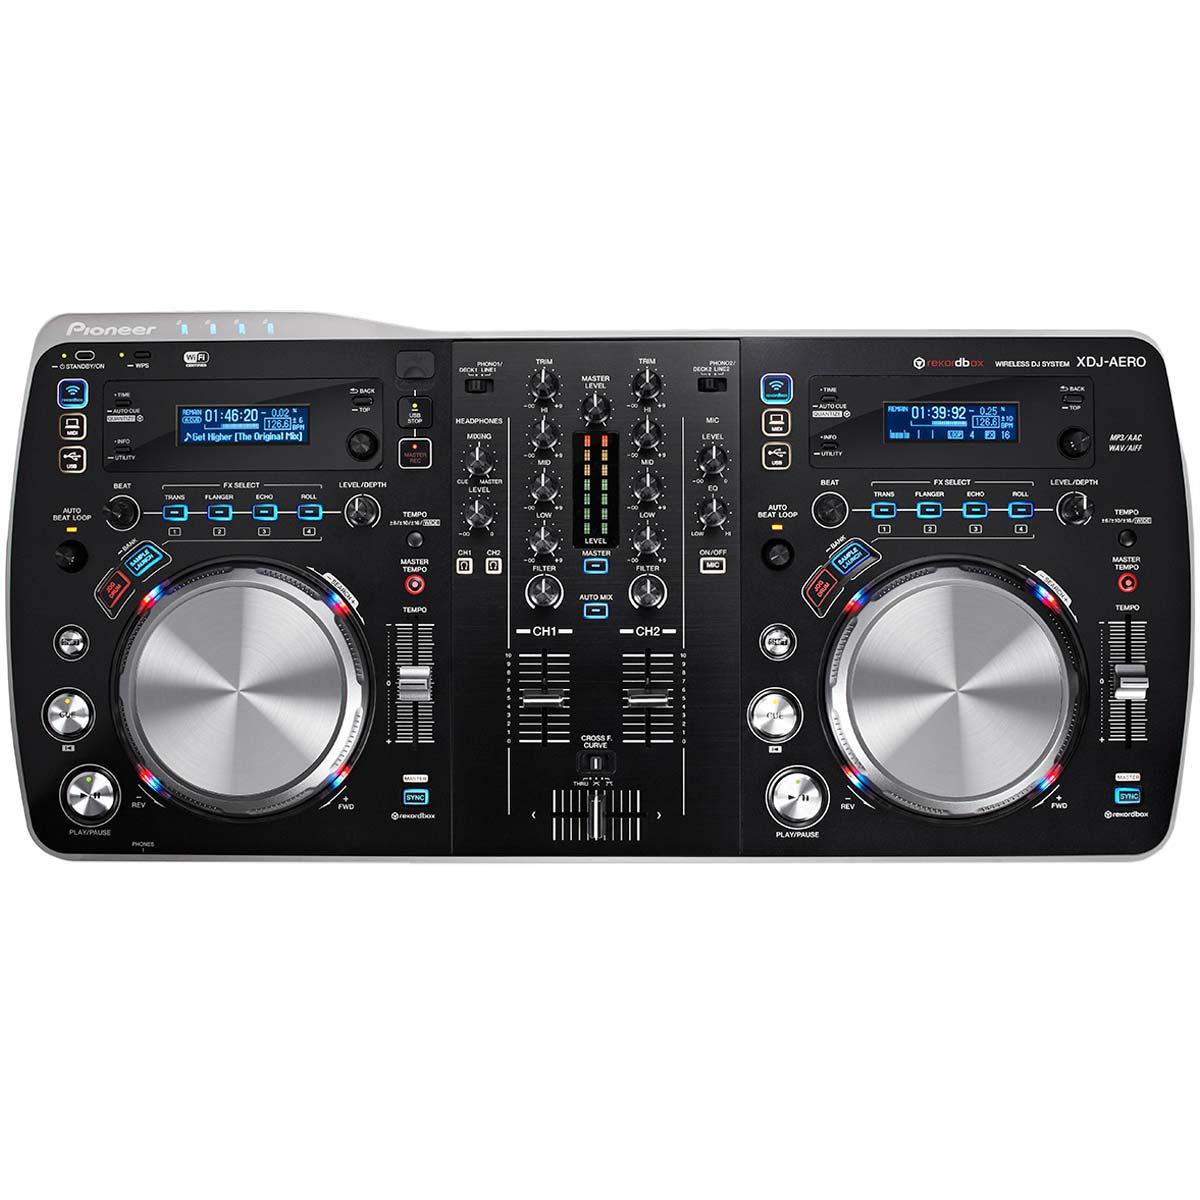 XDJAERO - Controladora DJ c/ Wireless XDJ AERO Preta - Pioneer